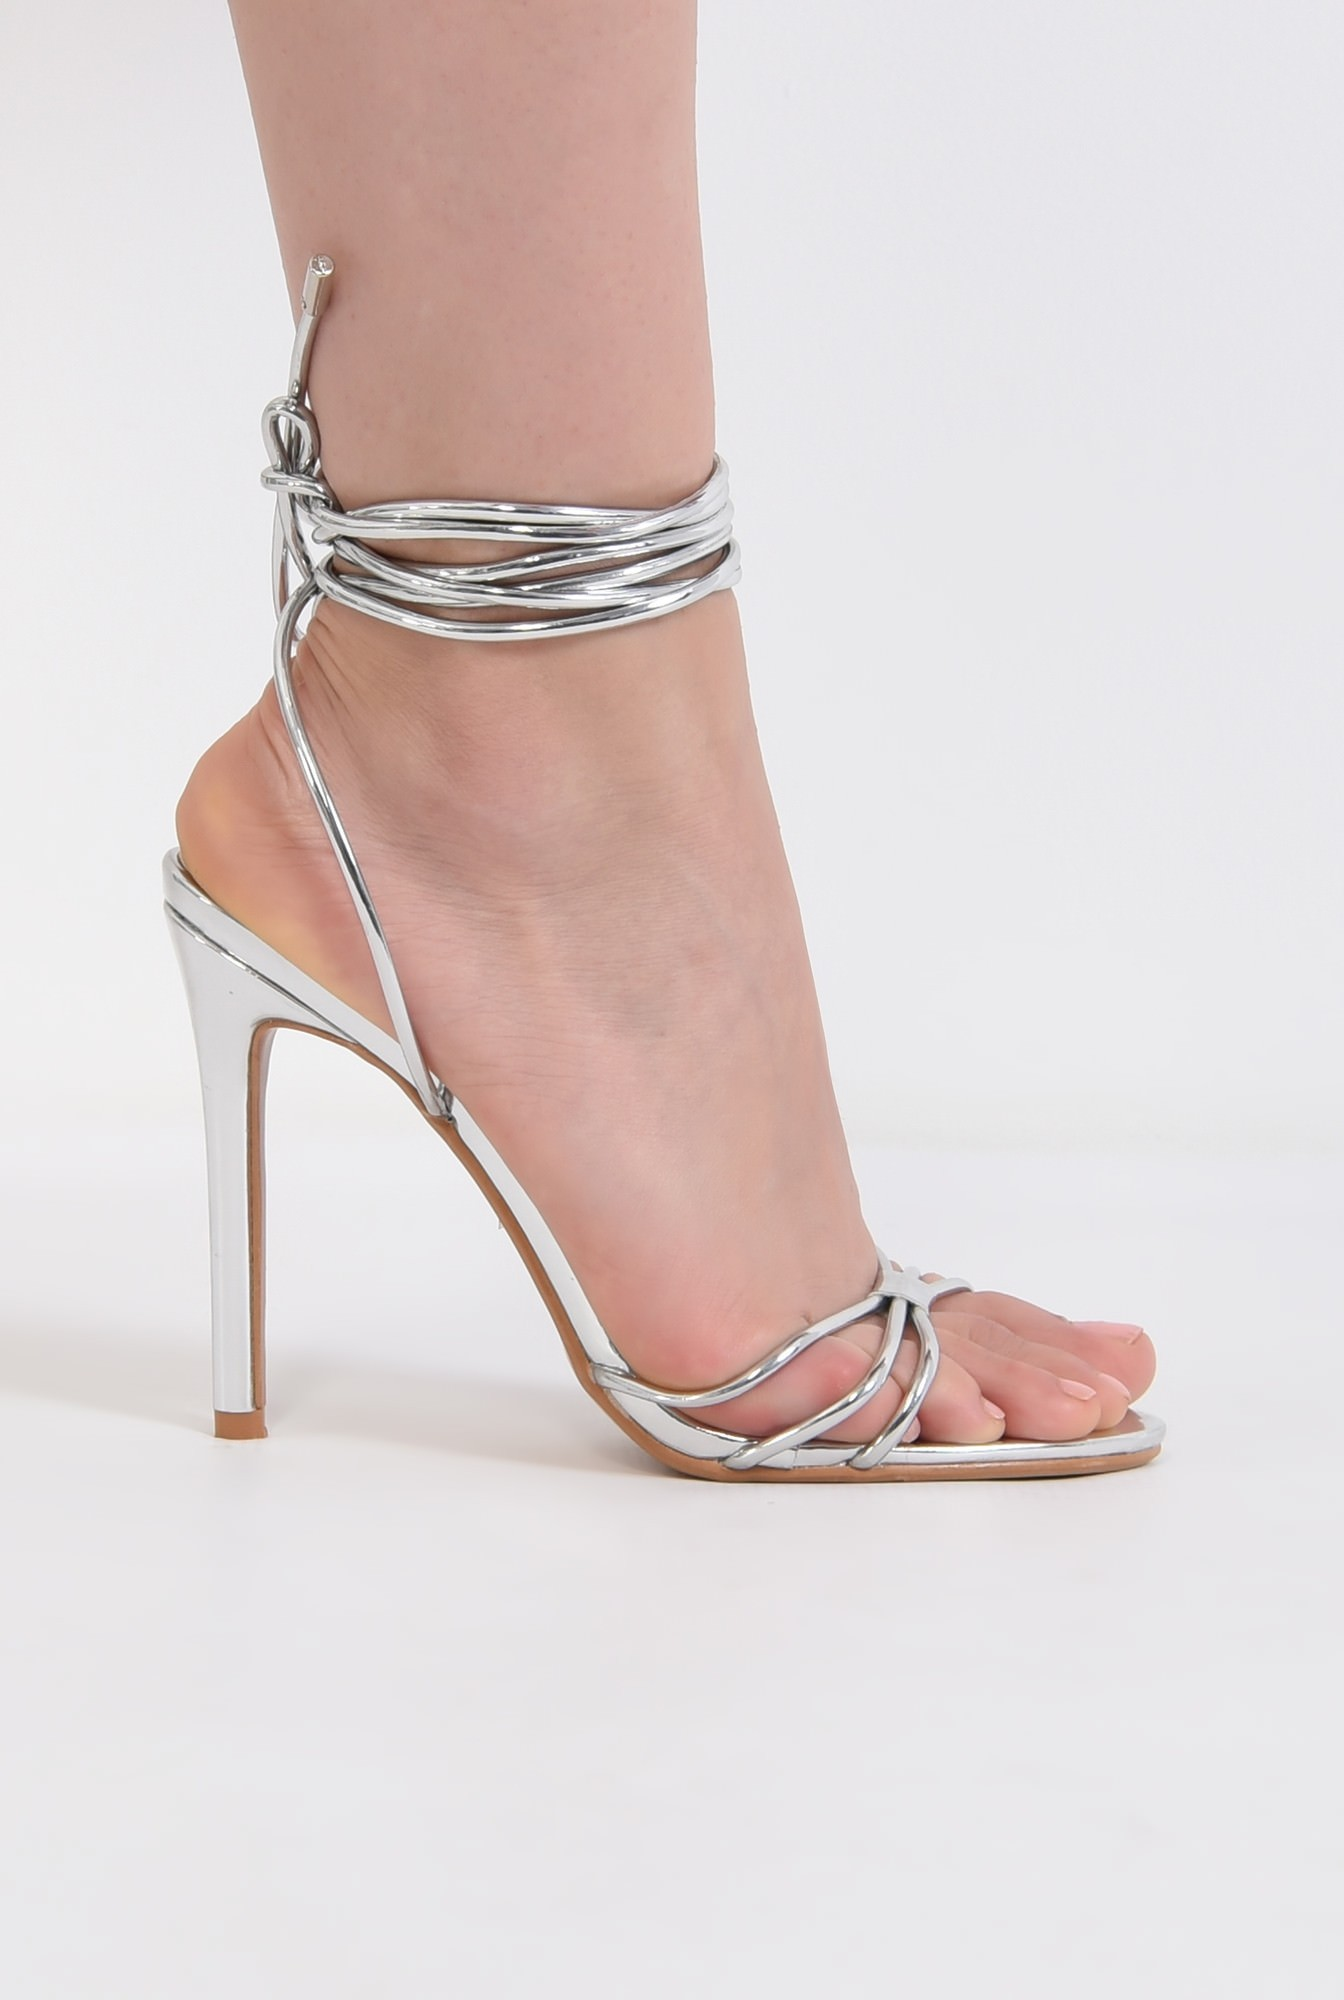 0 - sandale elegante, argintii, cu snur, stiletto